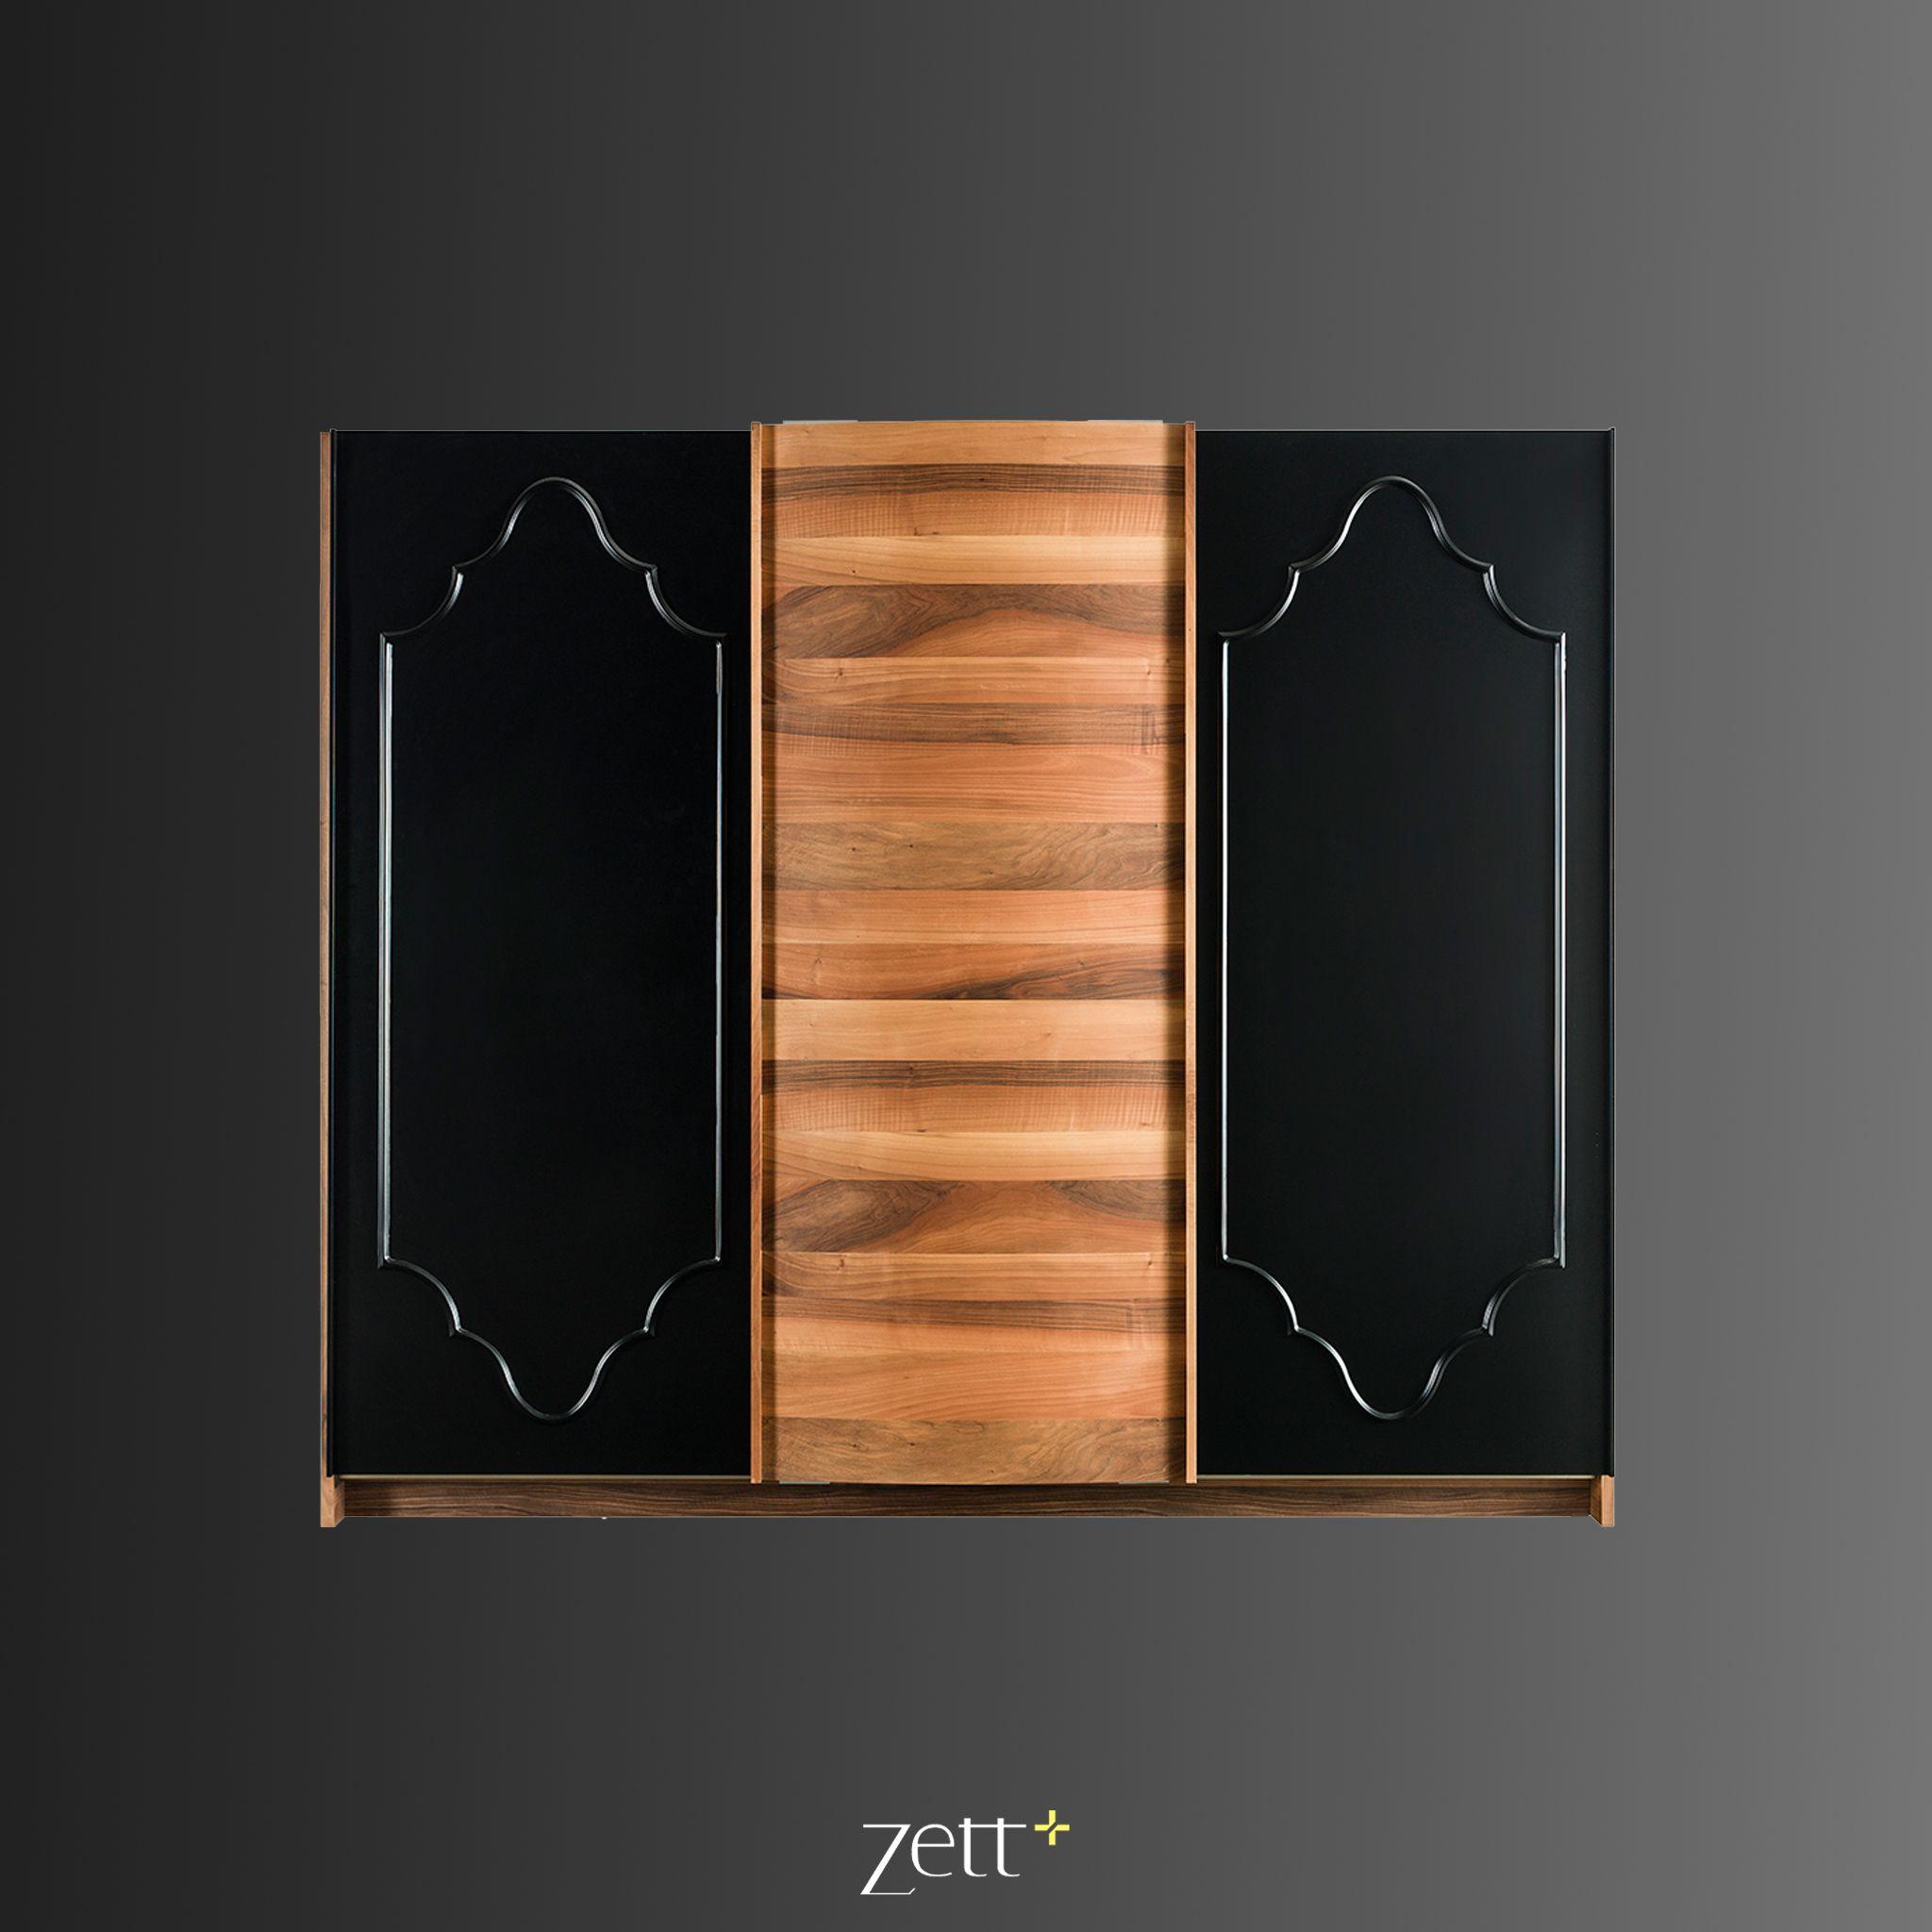 Zettplus Mobilya Furniture Ahsap Wooden Yatakodasi